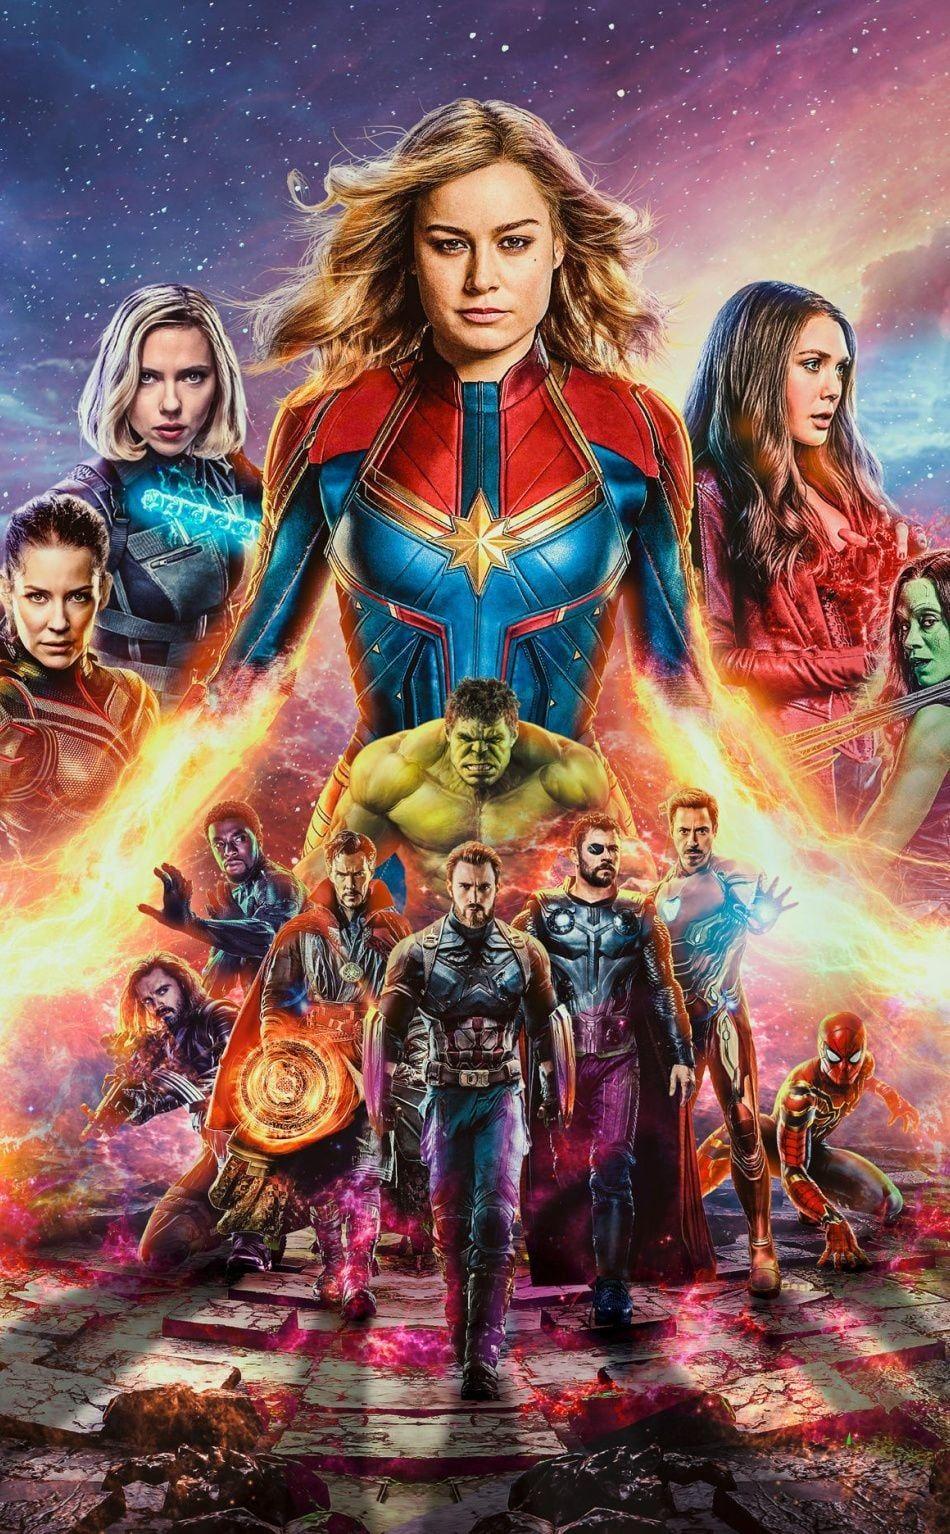 Vengadores Endgame Pelicula Completa Avengers Marvel Superheroes Marvel